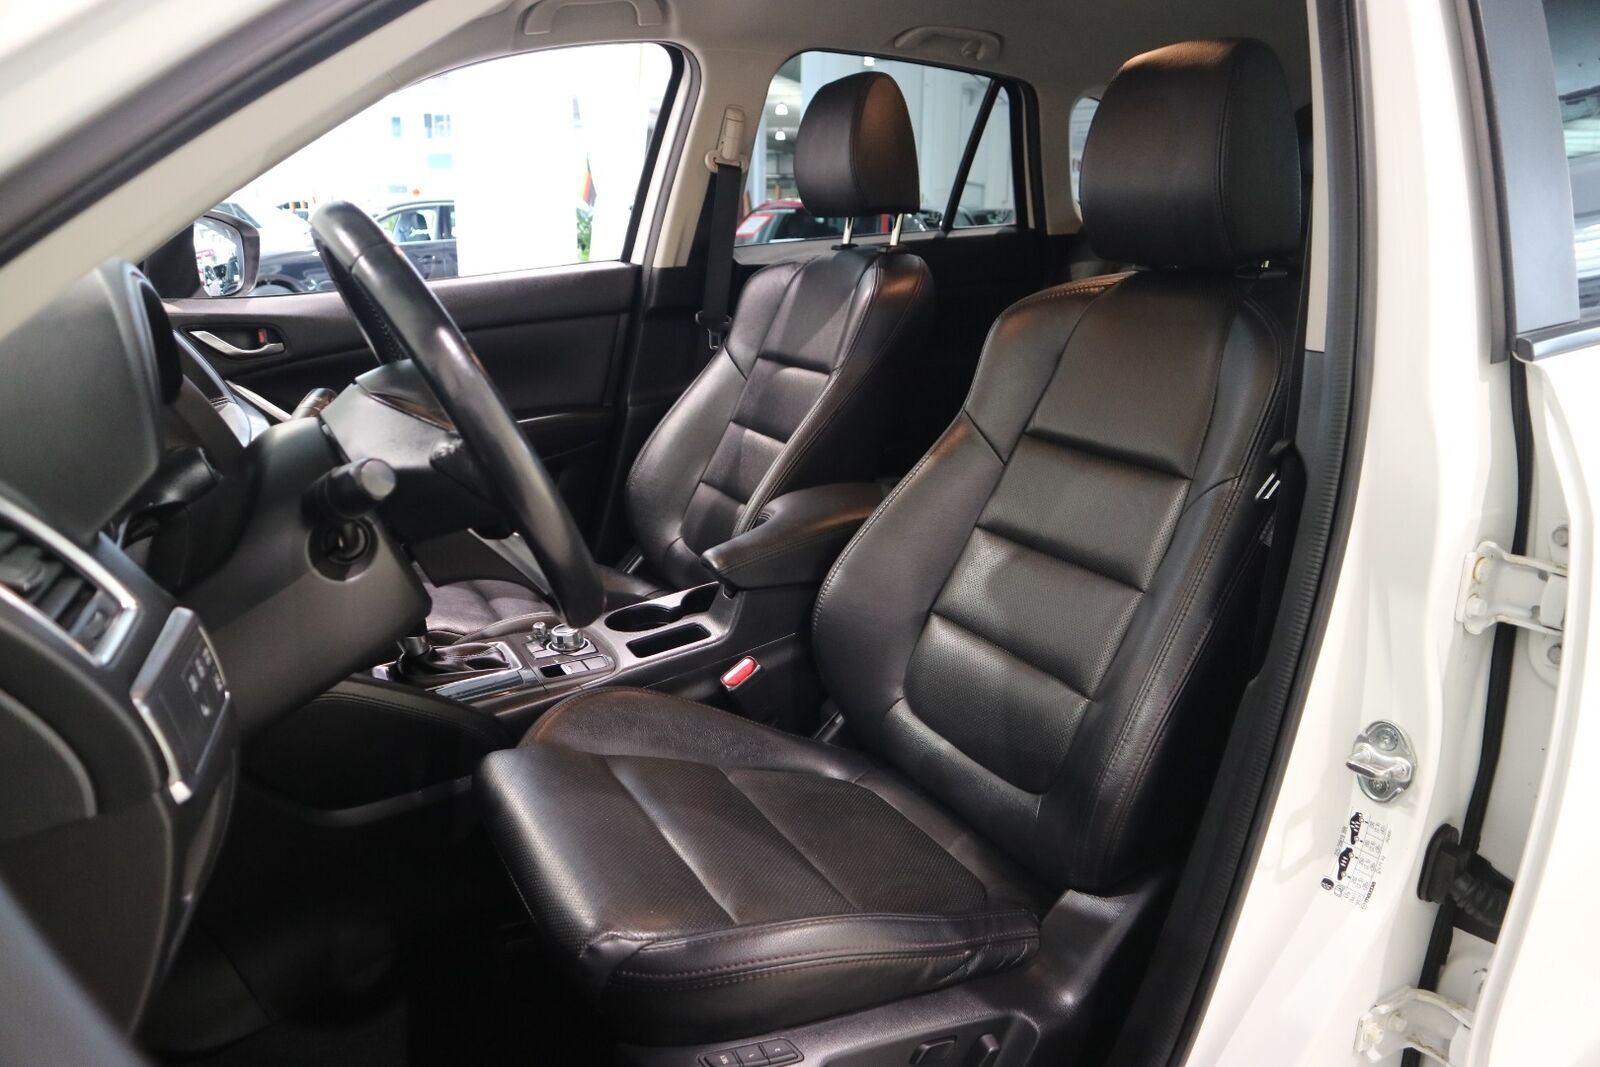 Mazda CX-5 2,2 SkyActiv-D 175 Optimum aut. AWD - billede 12